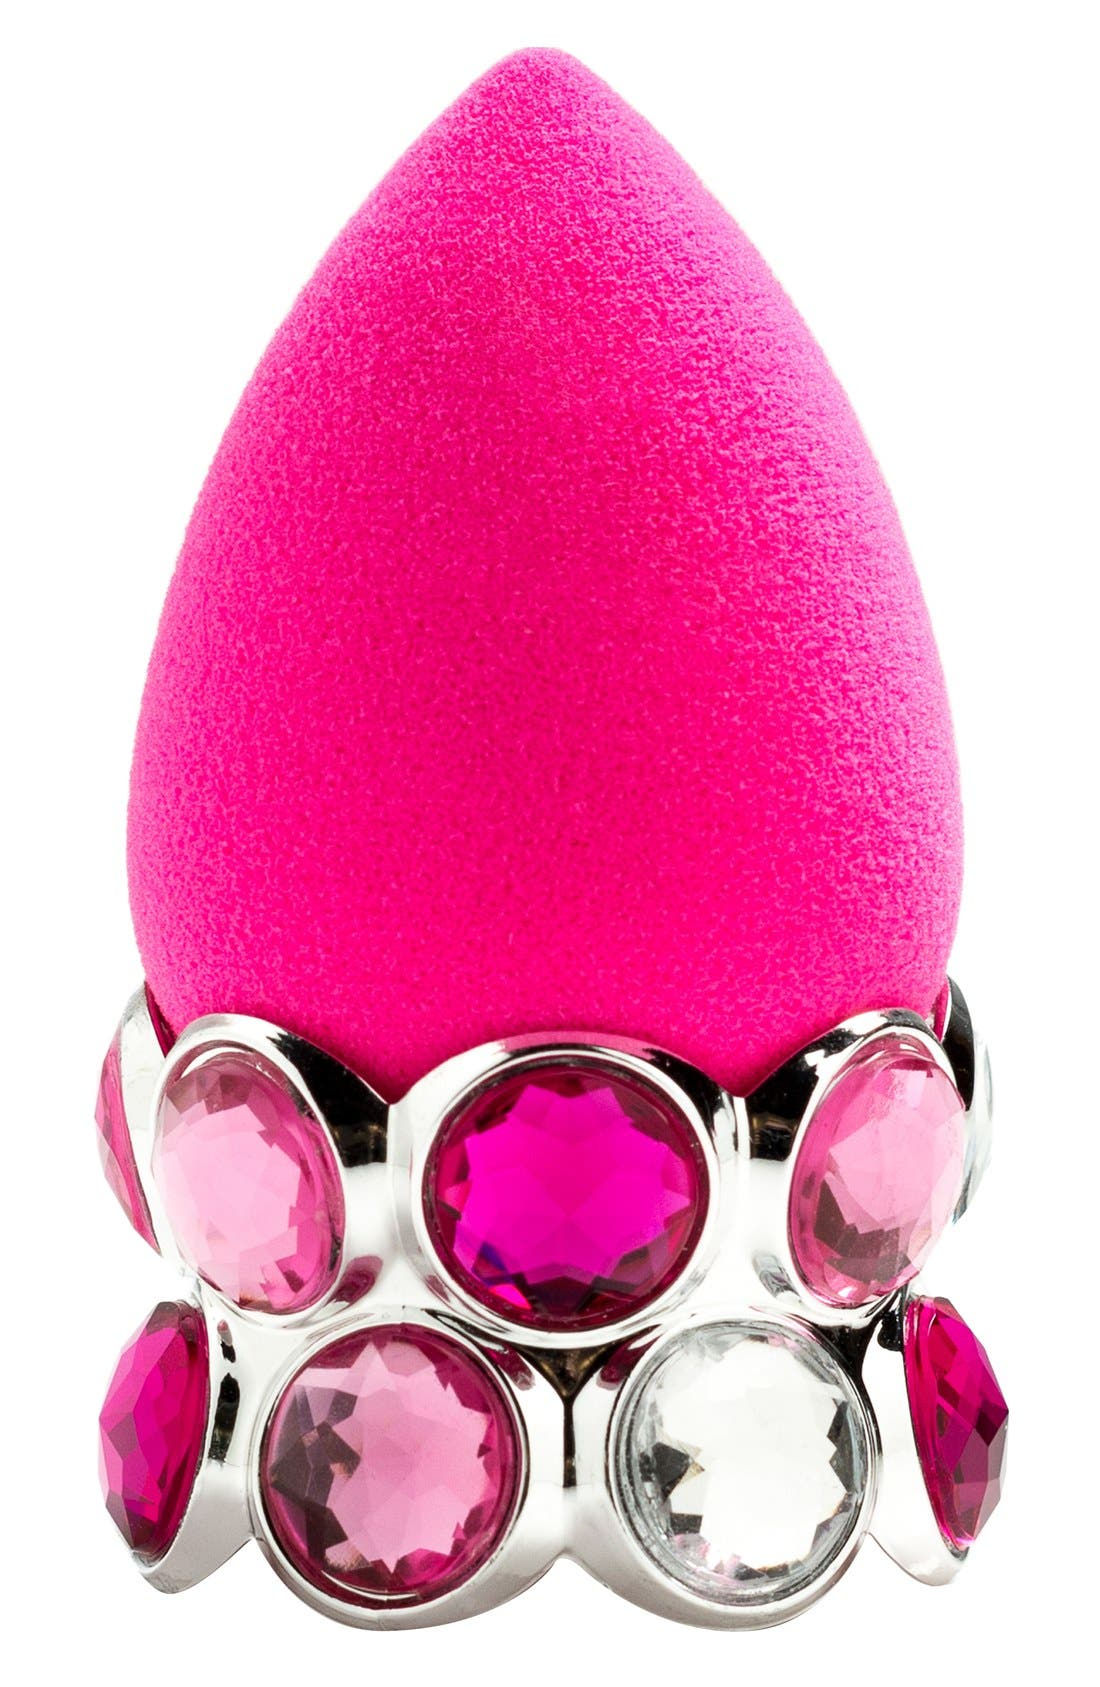 BEAUTYBLENDER<SUP>®</SUP>,                             'bling.ring' Drying Stand & Makeup Sponge Applicator,                             Main thumbnail 1, color,                             000